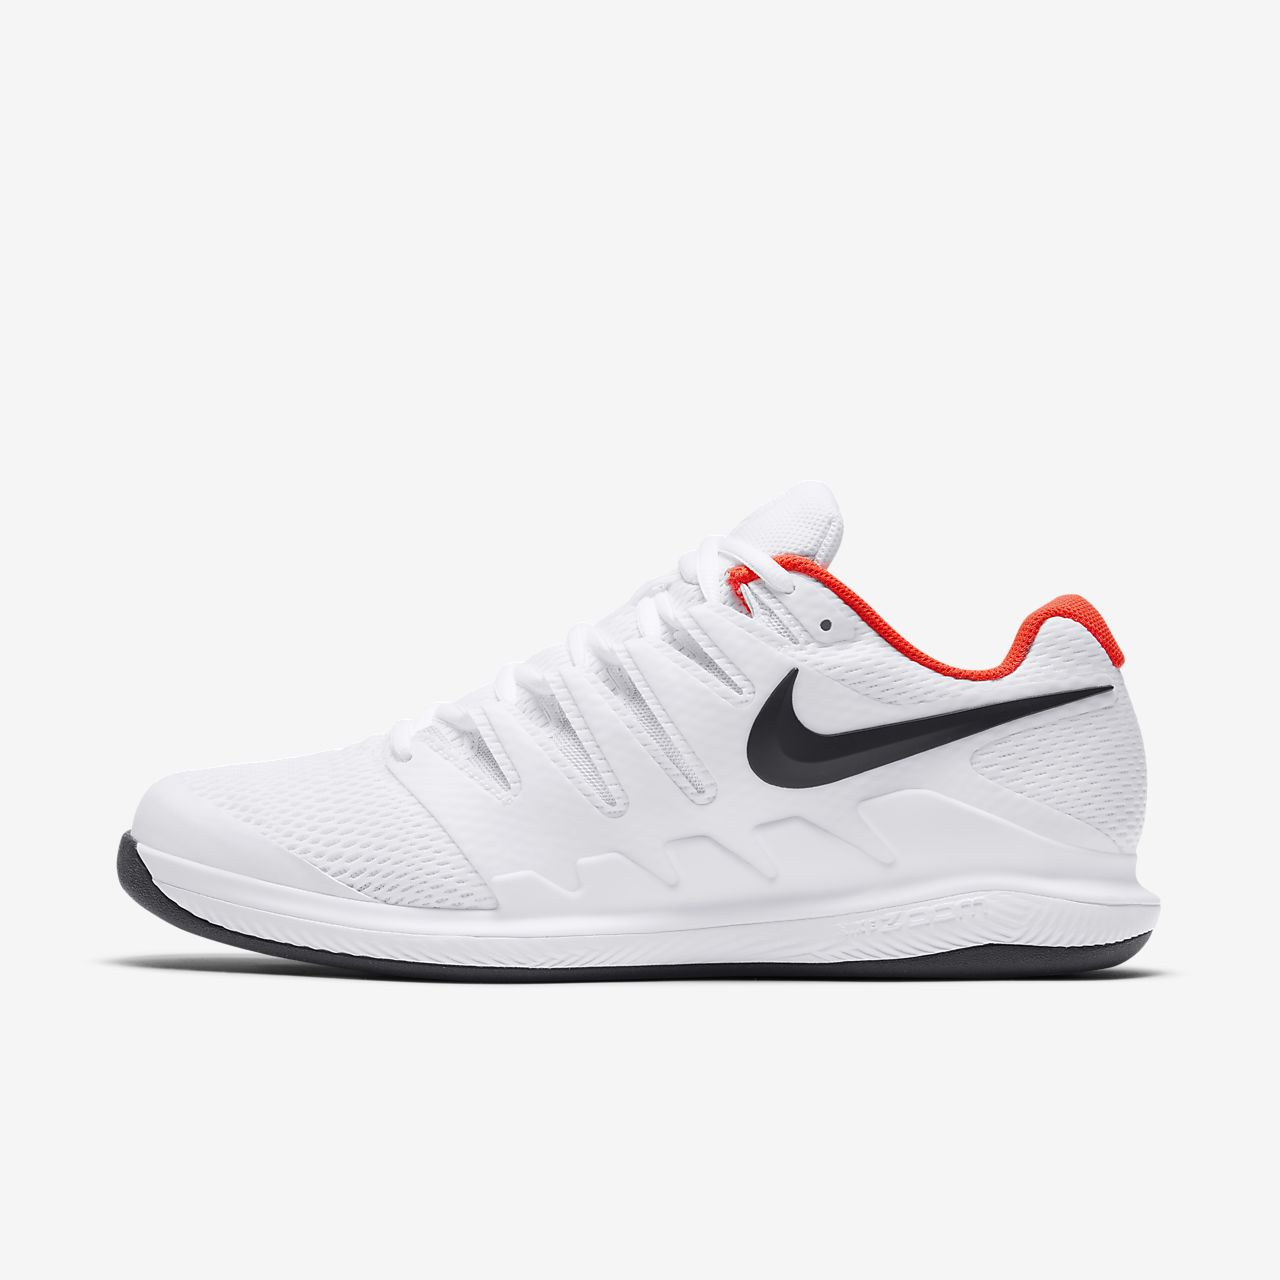 Nike Air Zoom Vapor X Carpet Sabatilles de tennis - Home